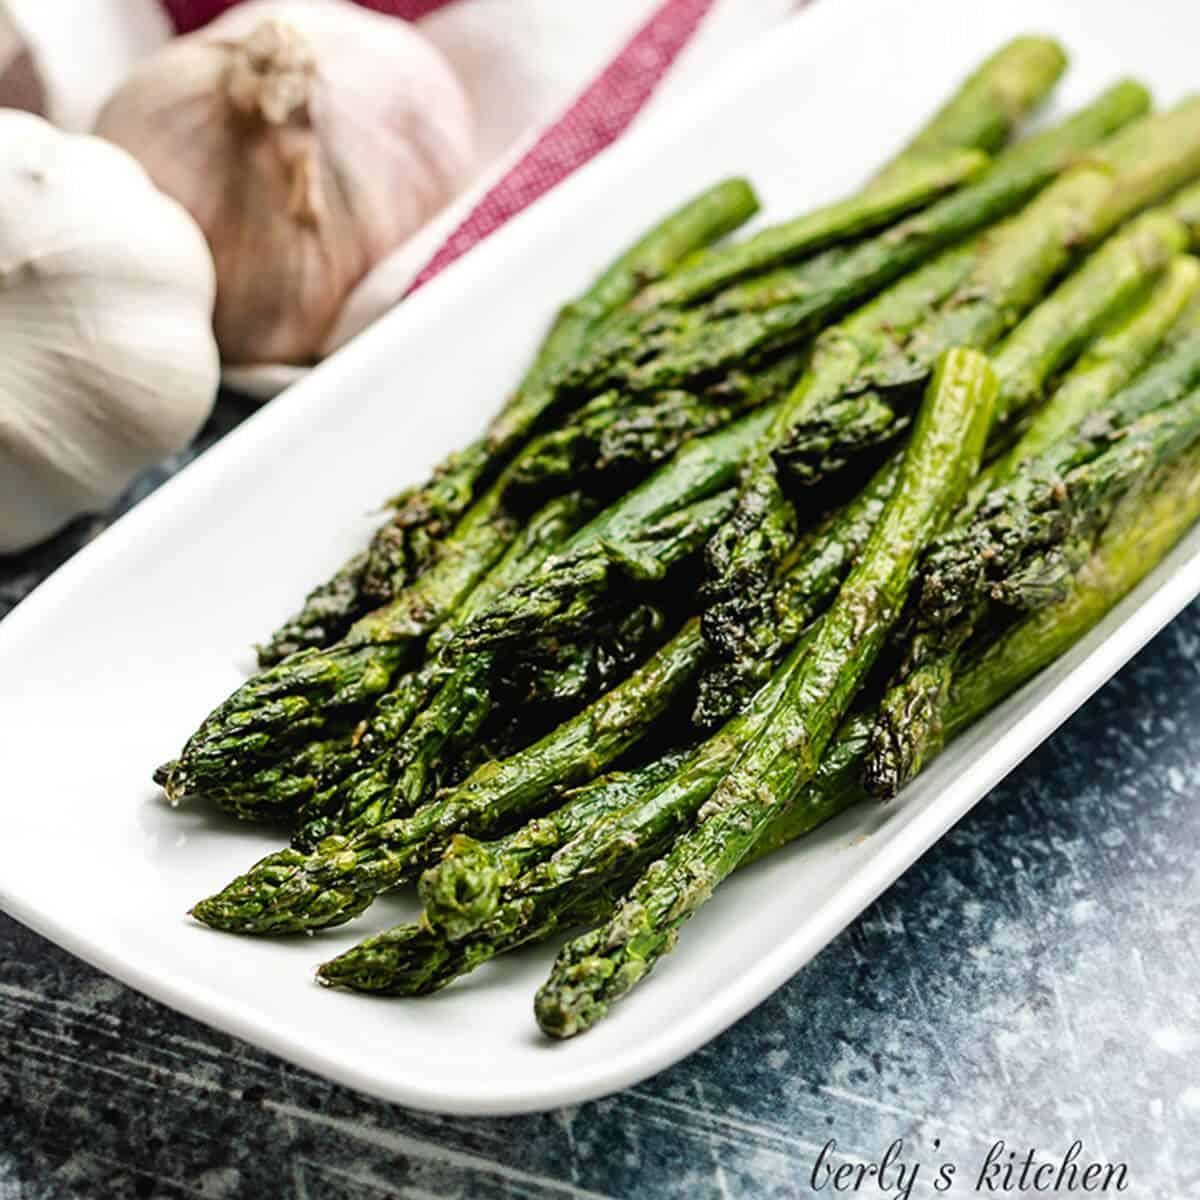 Seasoned air fryer asparagus served on a platter.